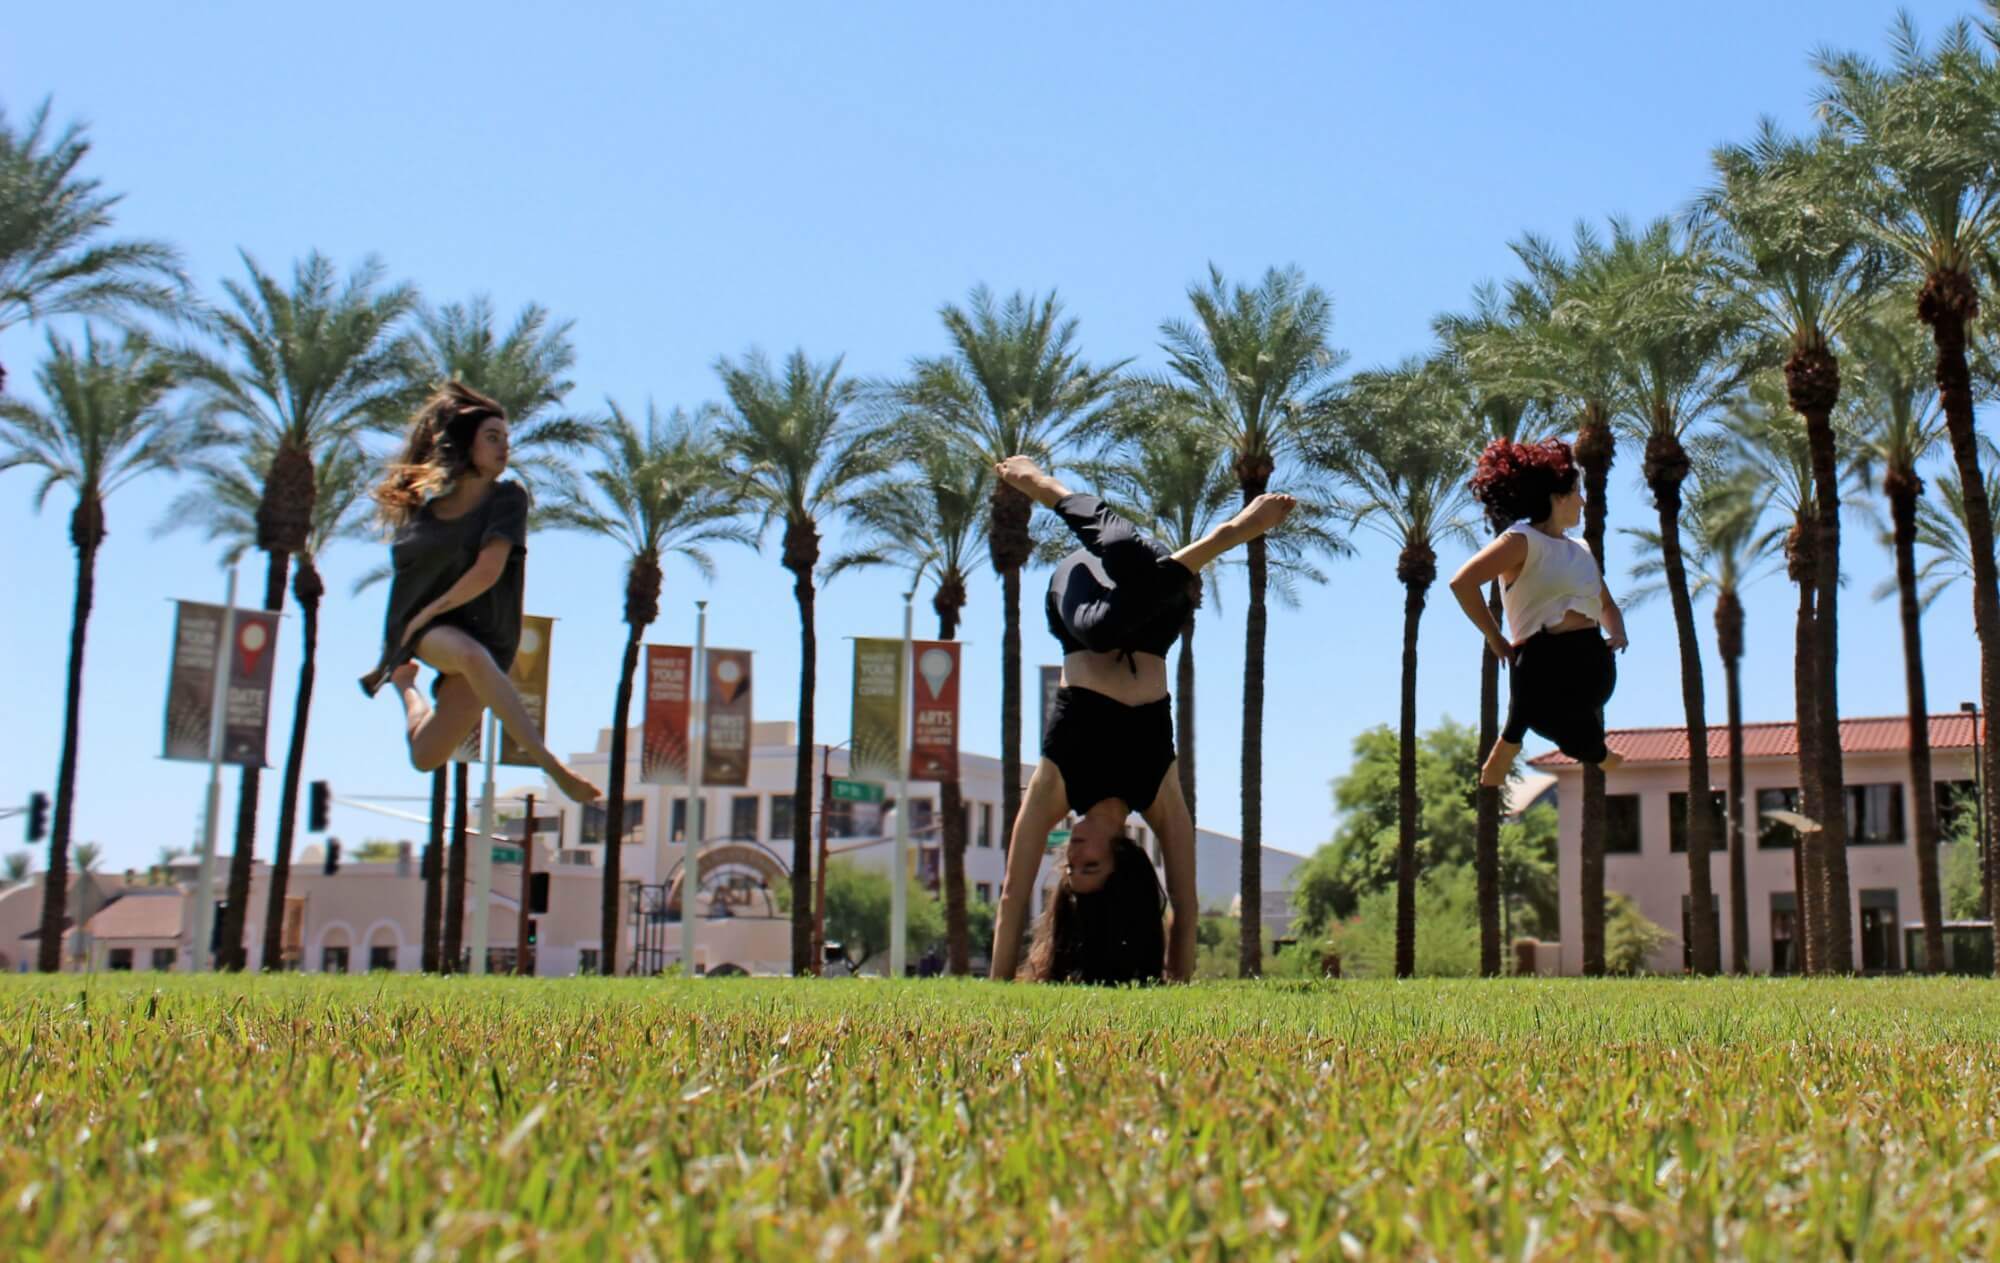 Dancers Olivia Poulter, Nicky Shindler and Johanna Hayes. Photo by Ashley Baker.